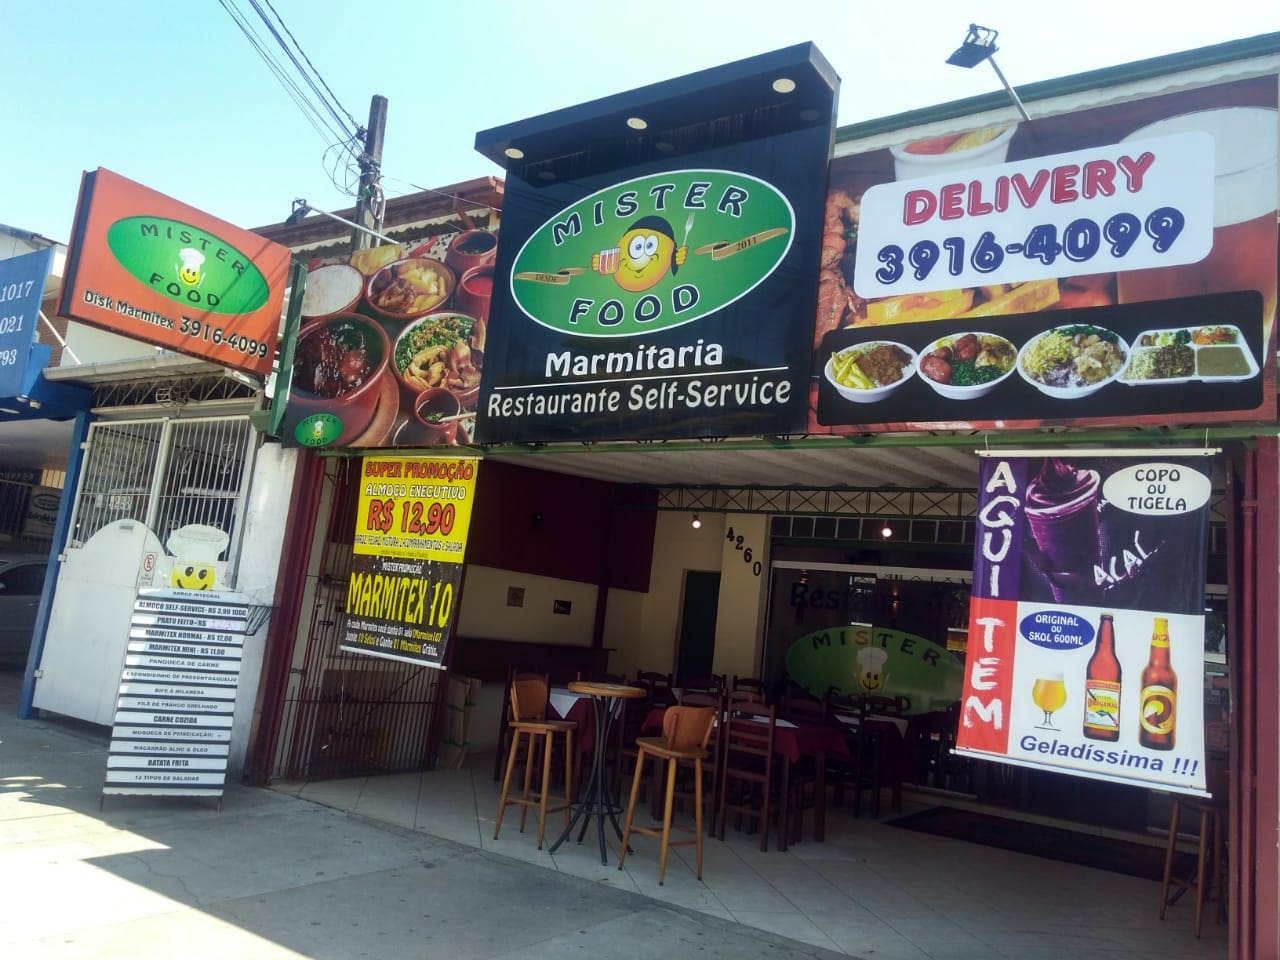 Mister Food Restaurante